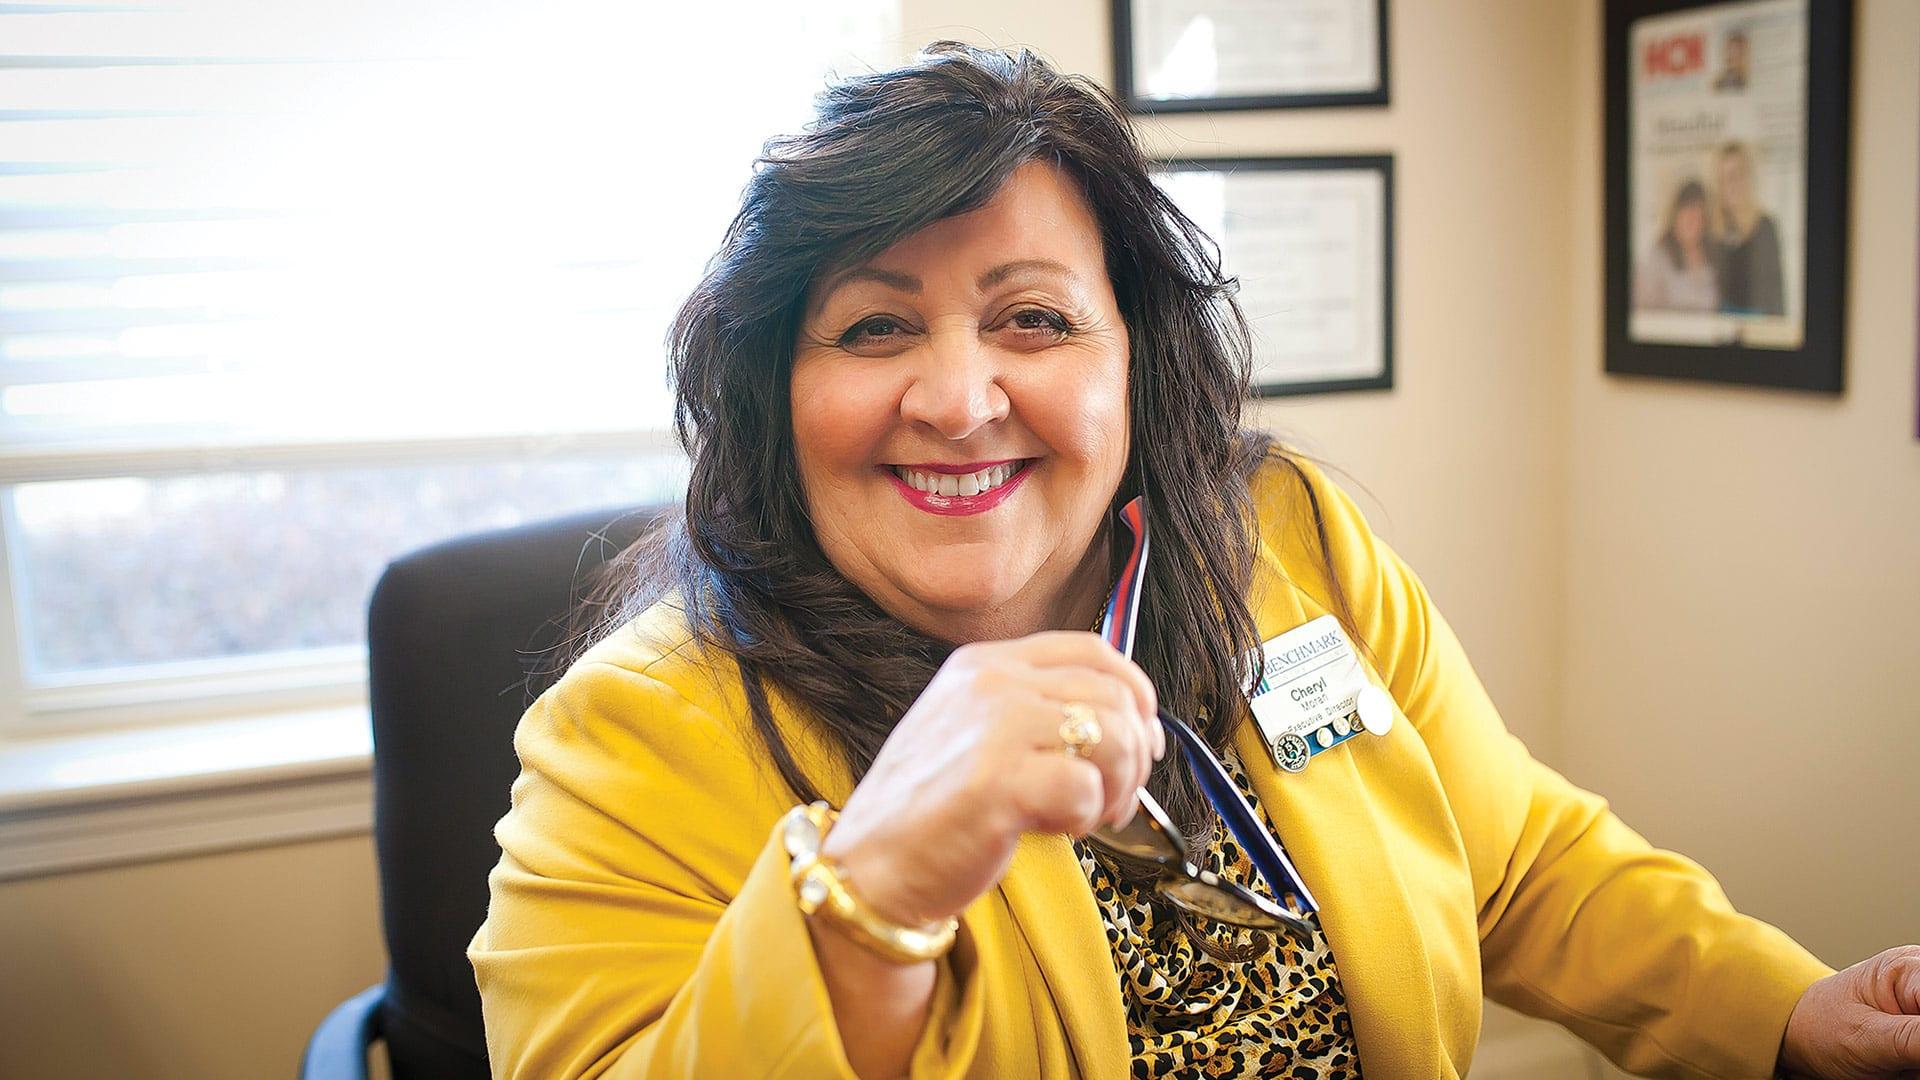 Cheryl Moran says she increased staffers' hours